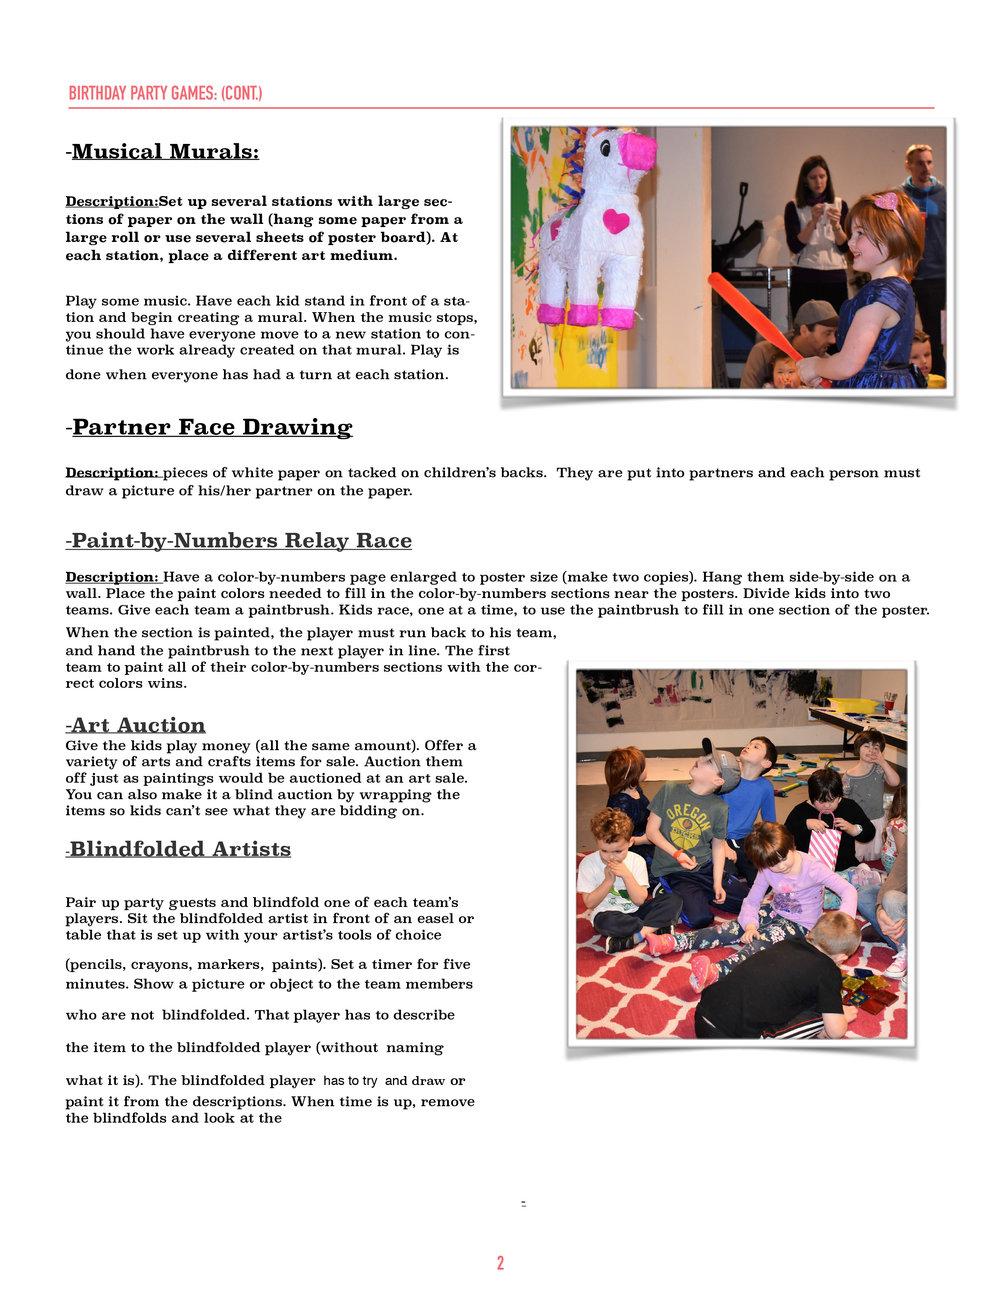 Birthday Handout Info-web-2.jpg